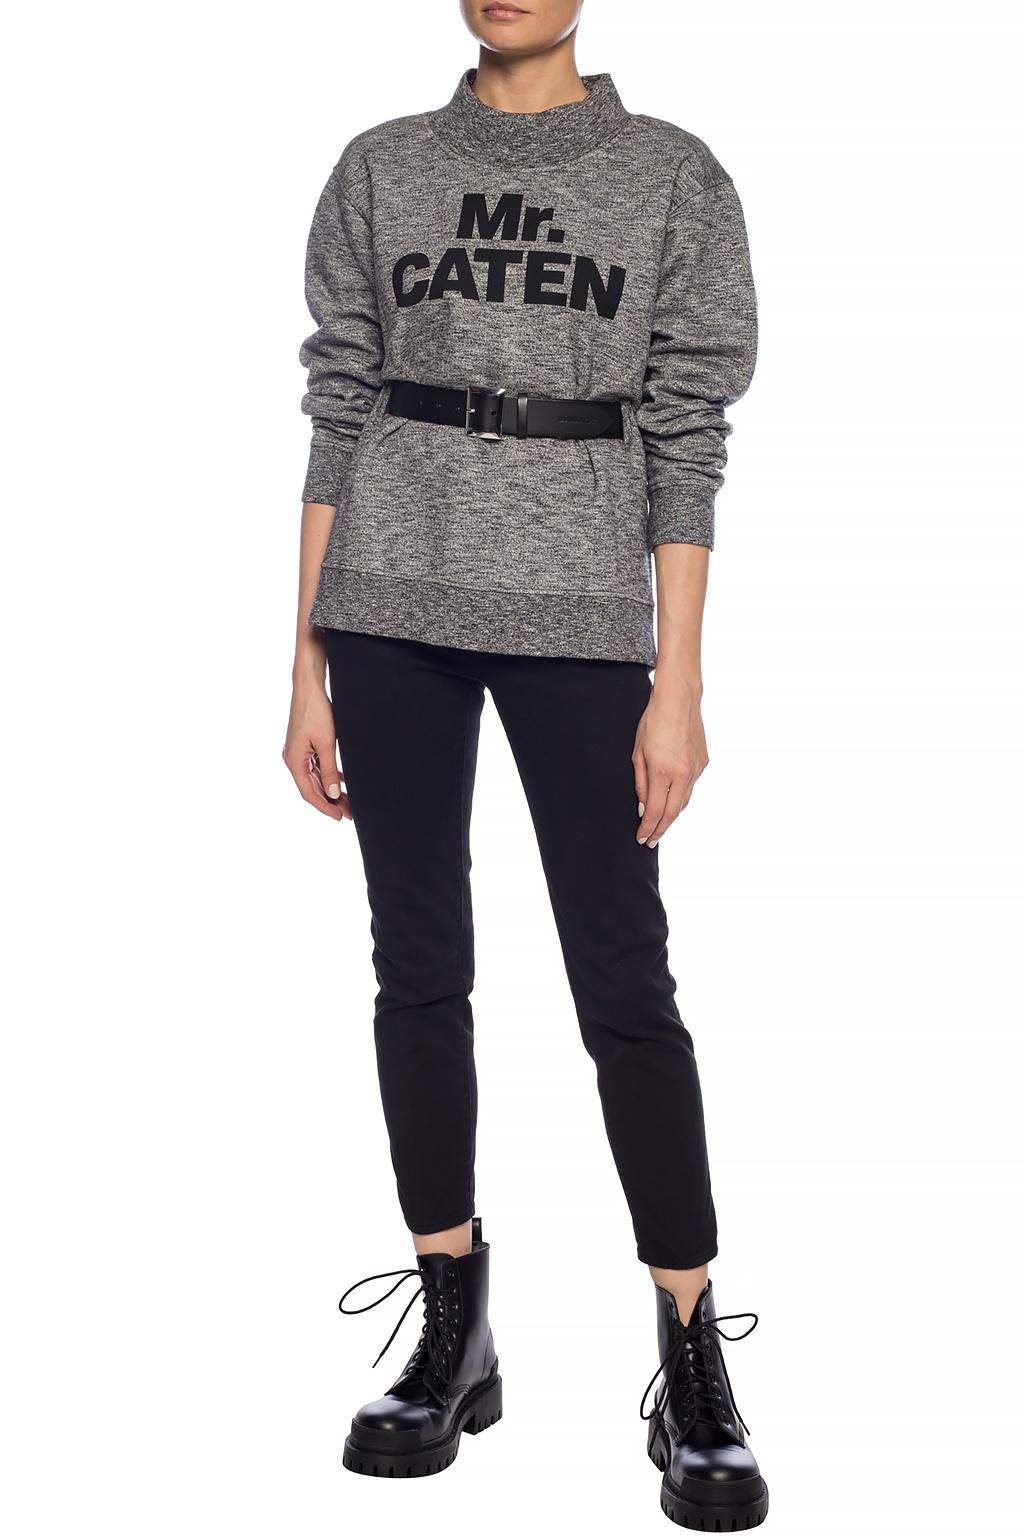 Dsquared2 Striped sweatshirt